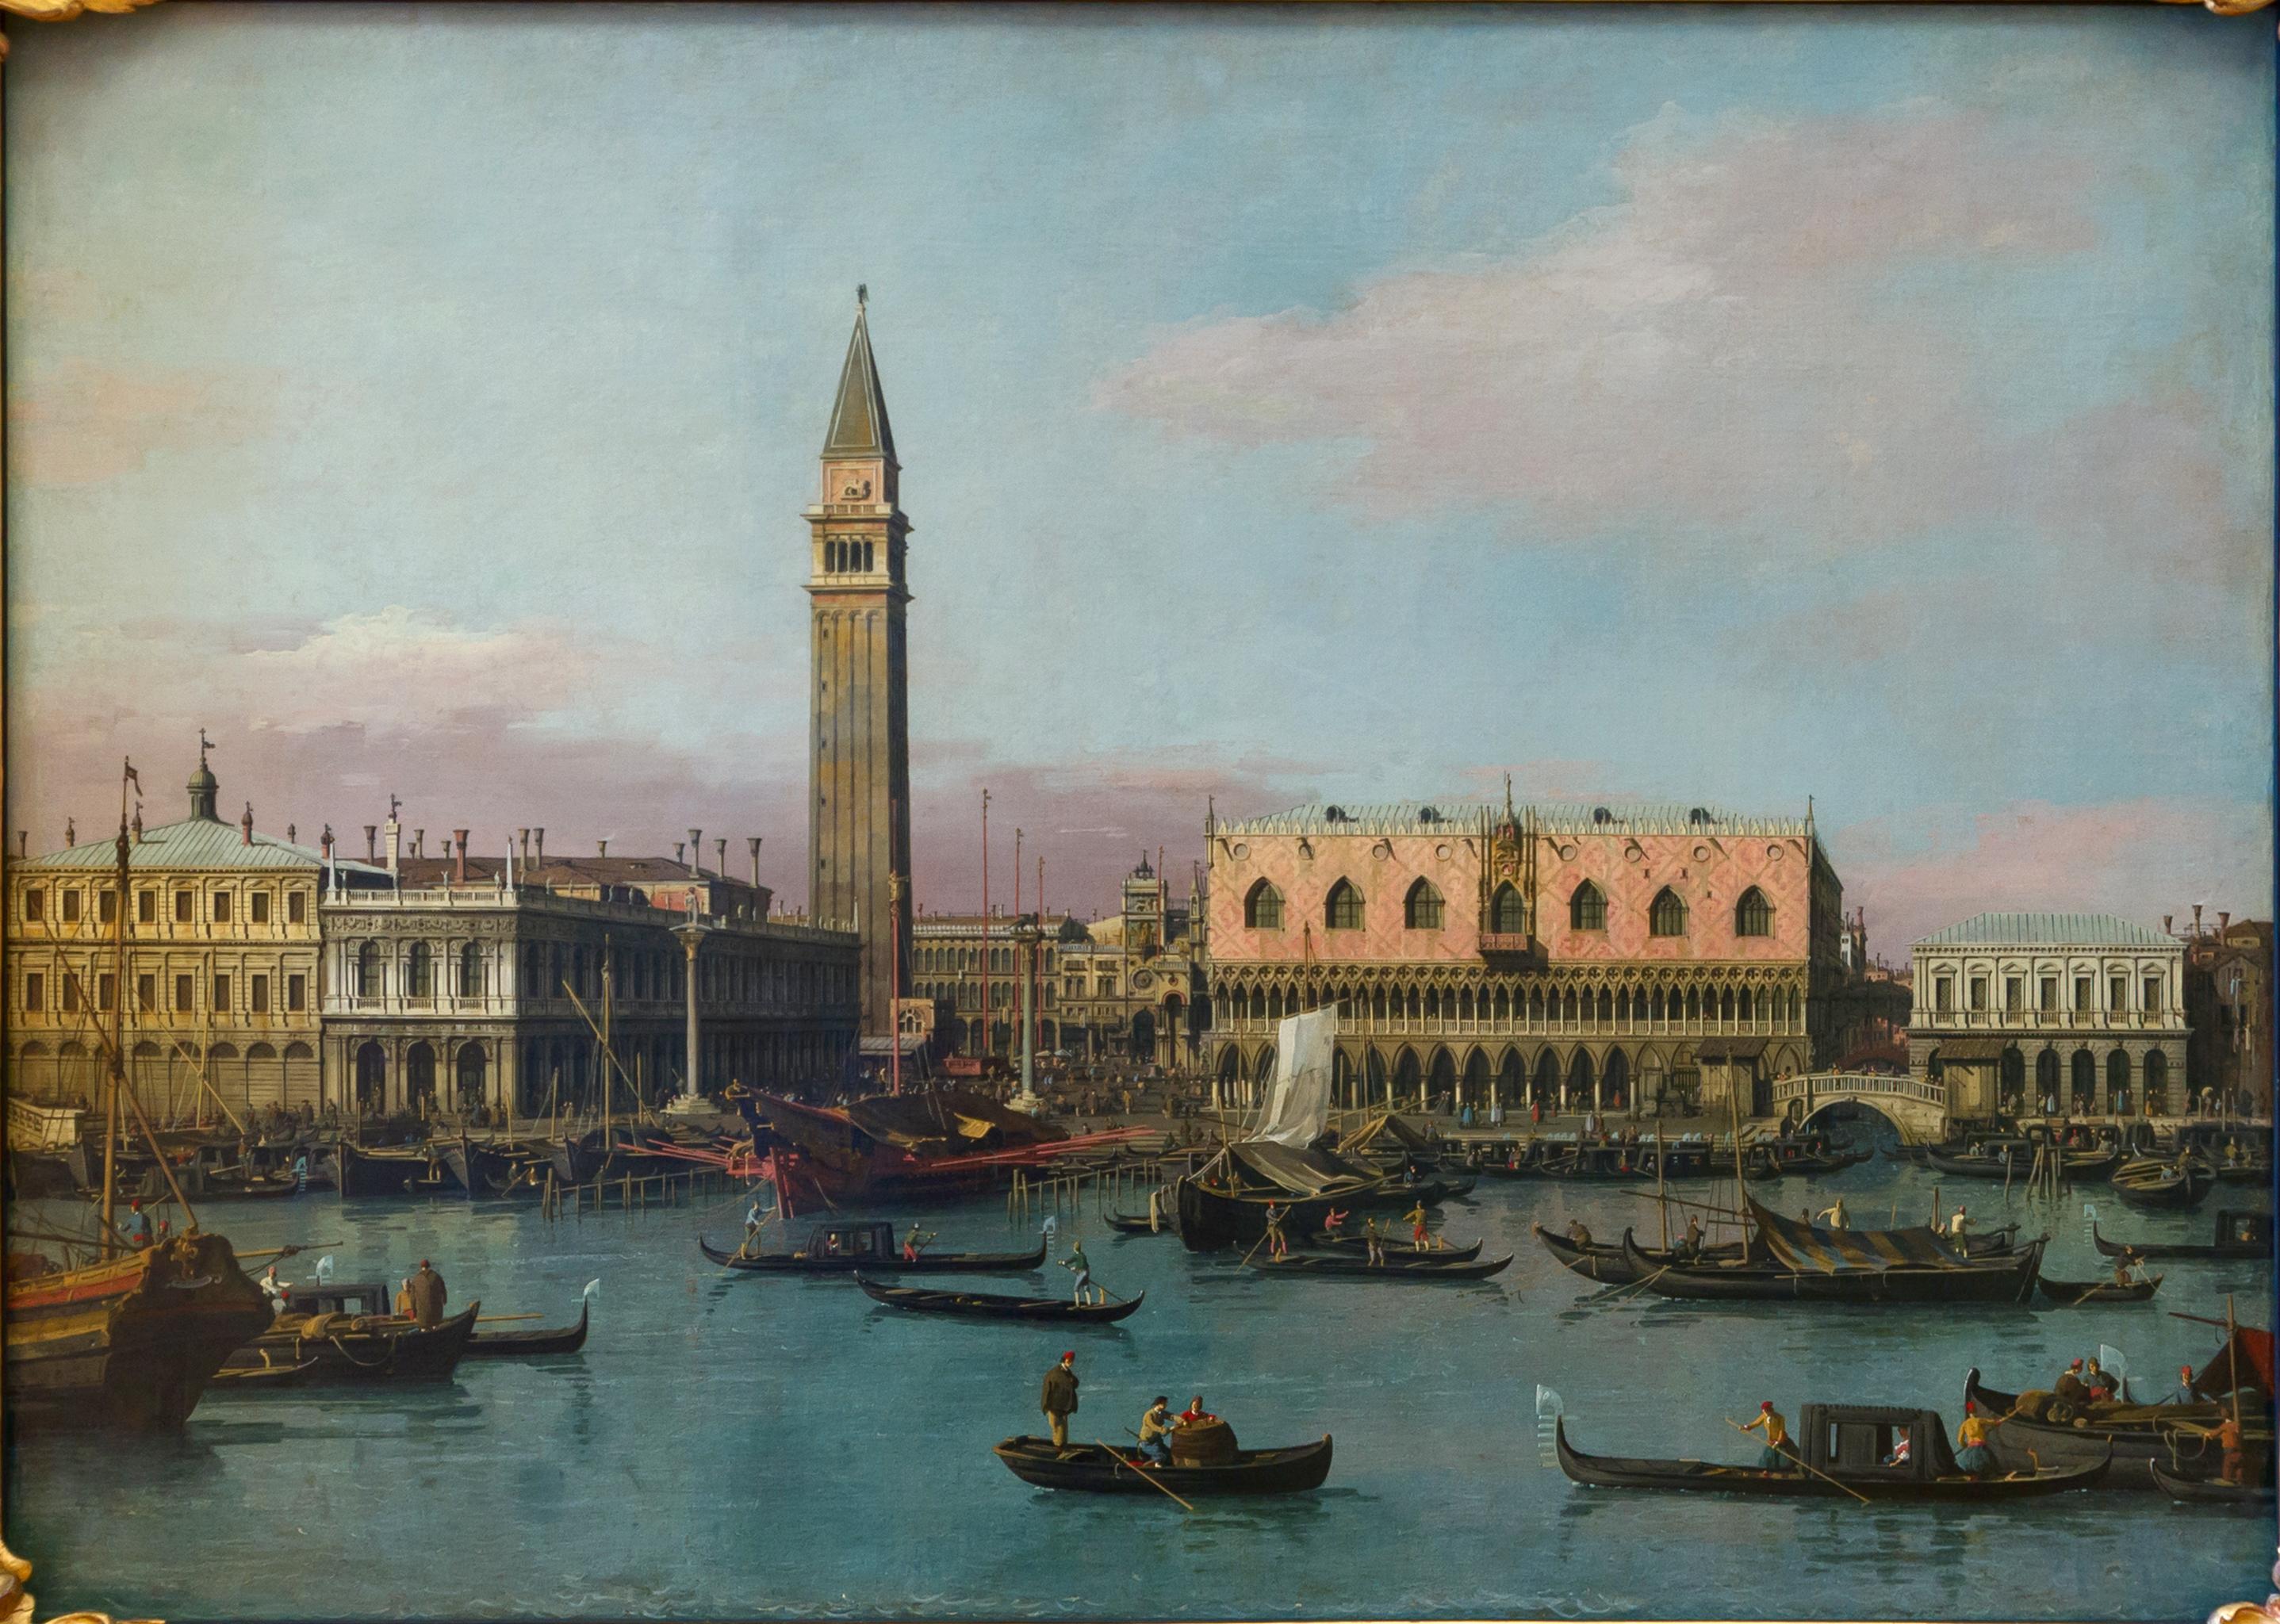 Venetian Empire Buildings